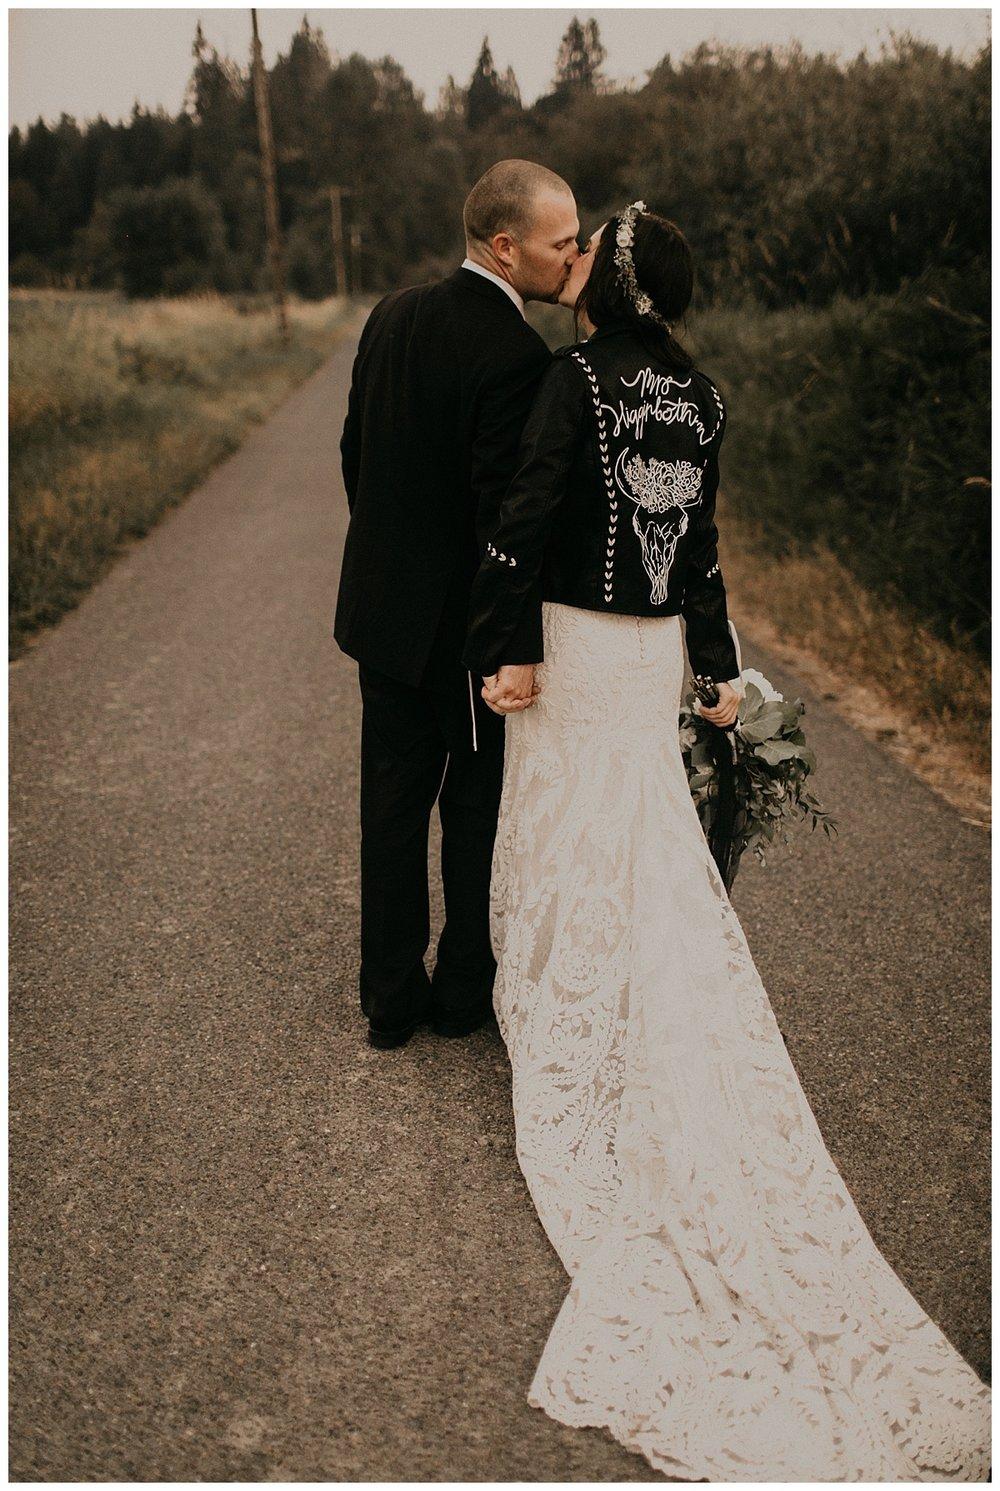 Samantha-McFarlen-PNW-Wedding-Photographer-Maroni-Meadows_1973.jpg